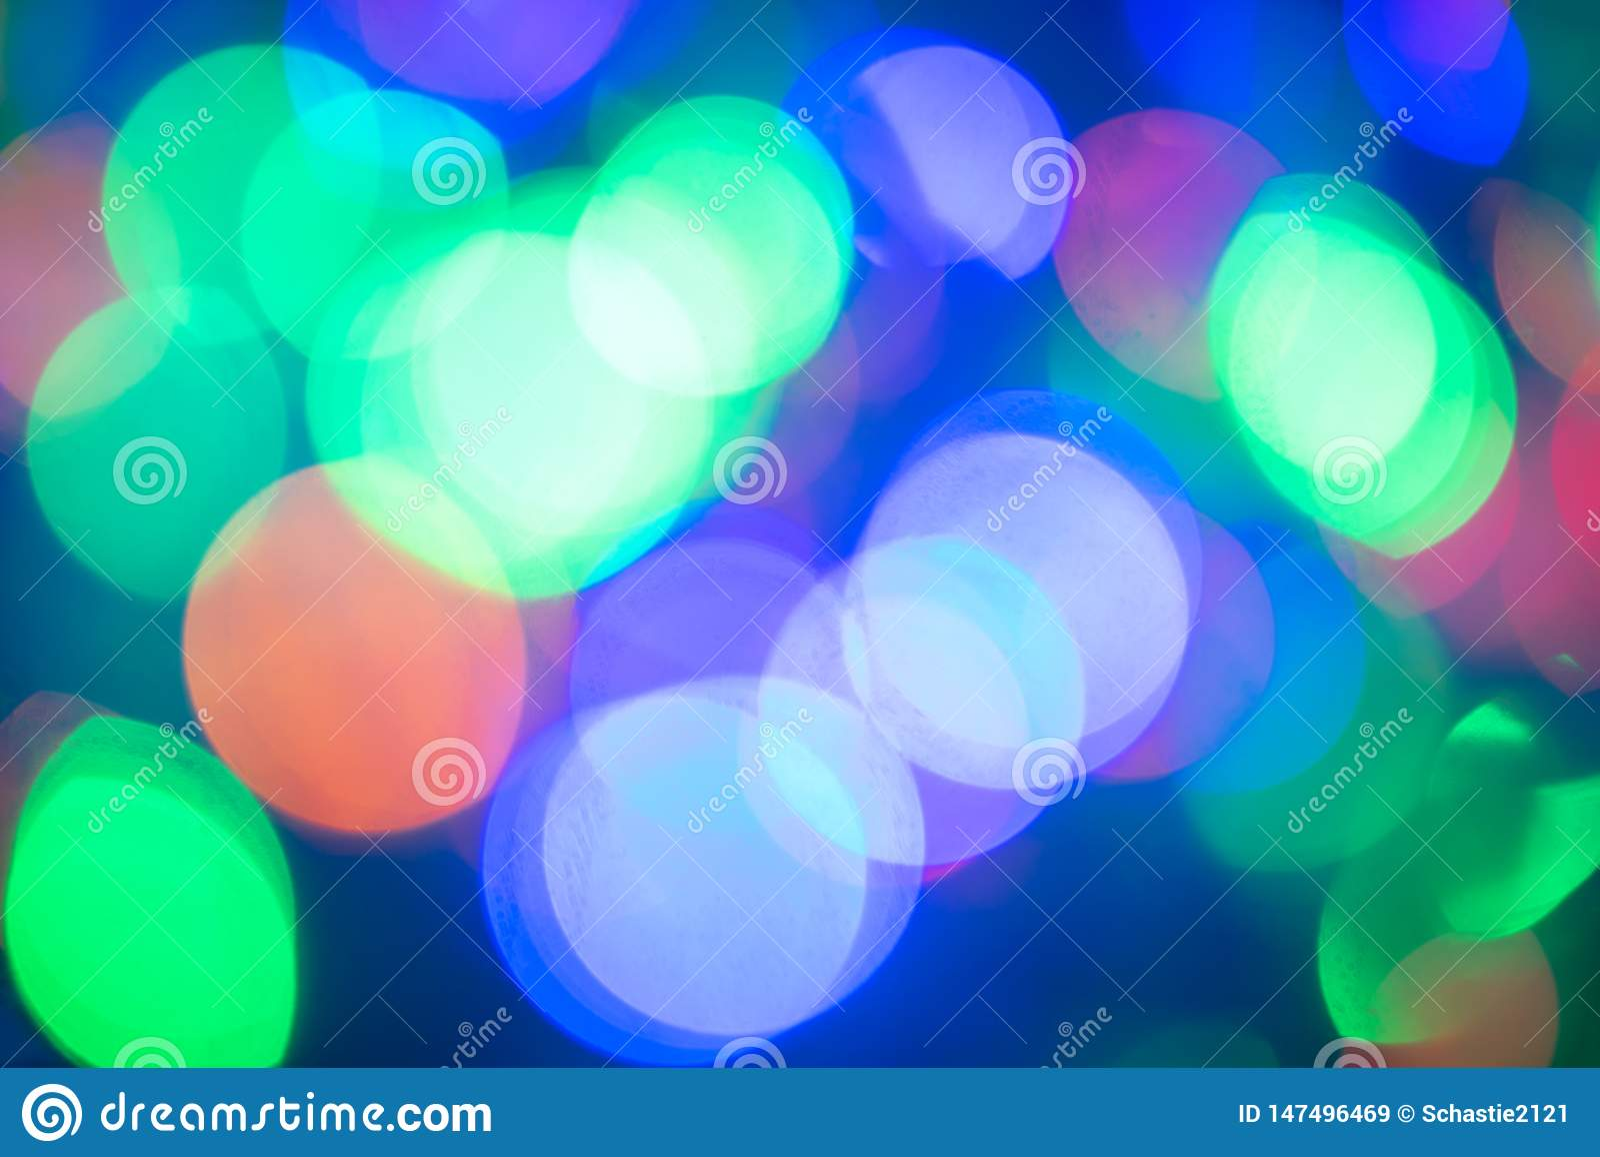 Bokeh. Blurred background. Festive colored lights